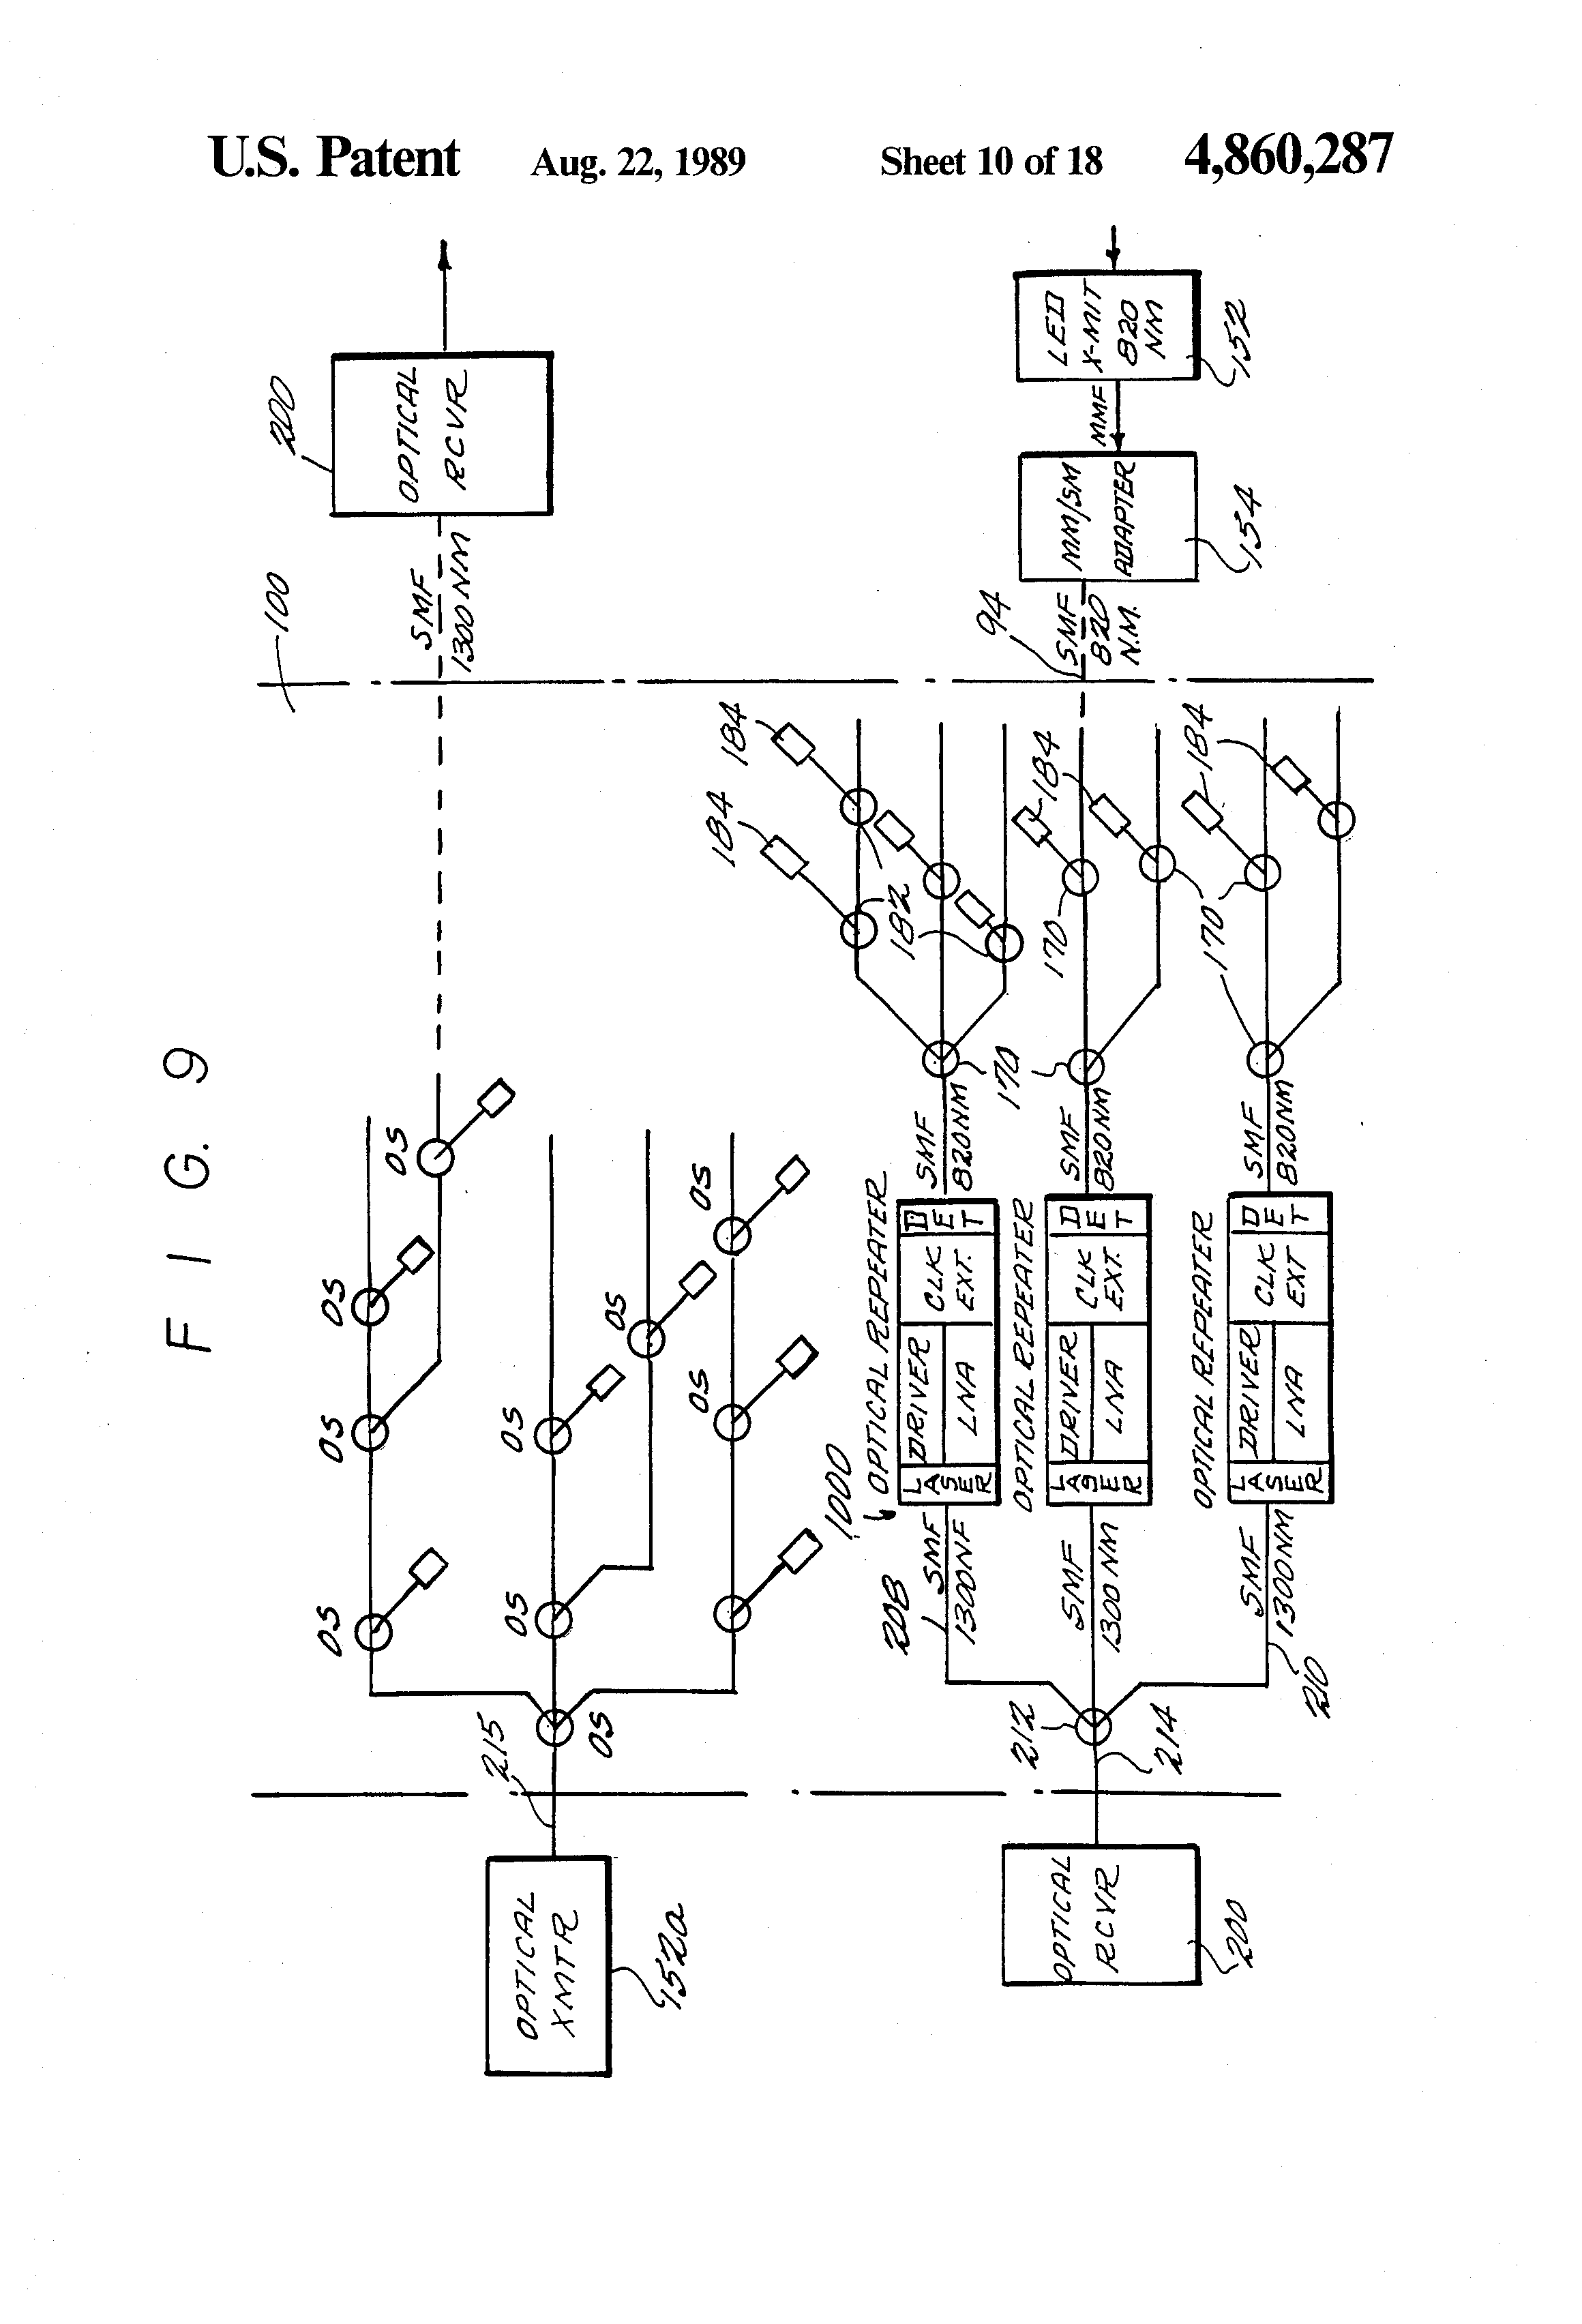 175 Watt Metal Halide Ballast Wiring Diagrams For Dummies 100 Diagram Mercury Vapor Imageresizertool Com M90 400